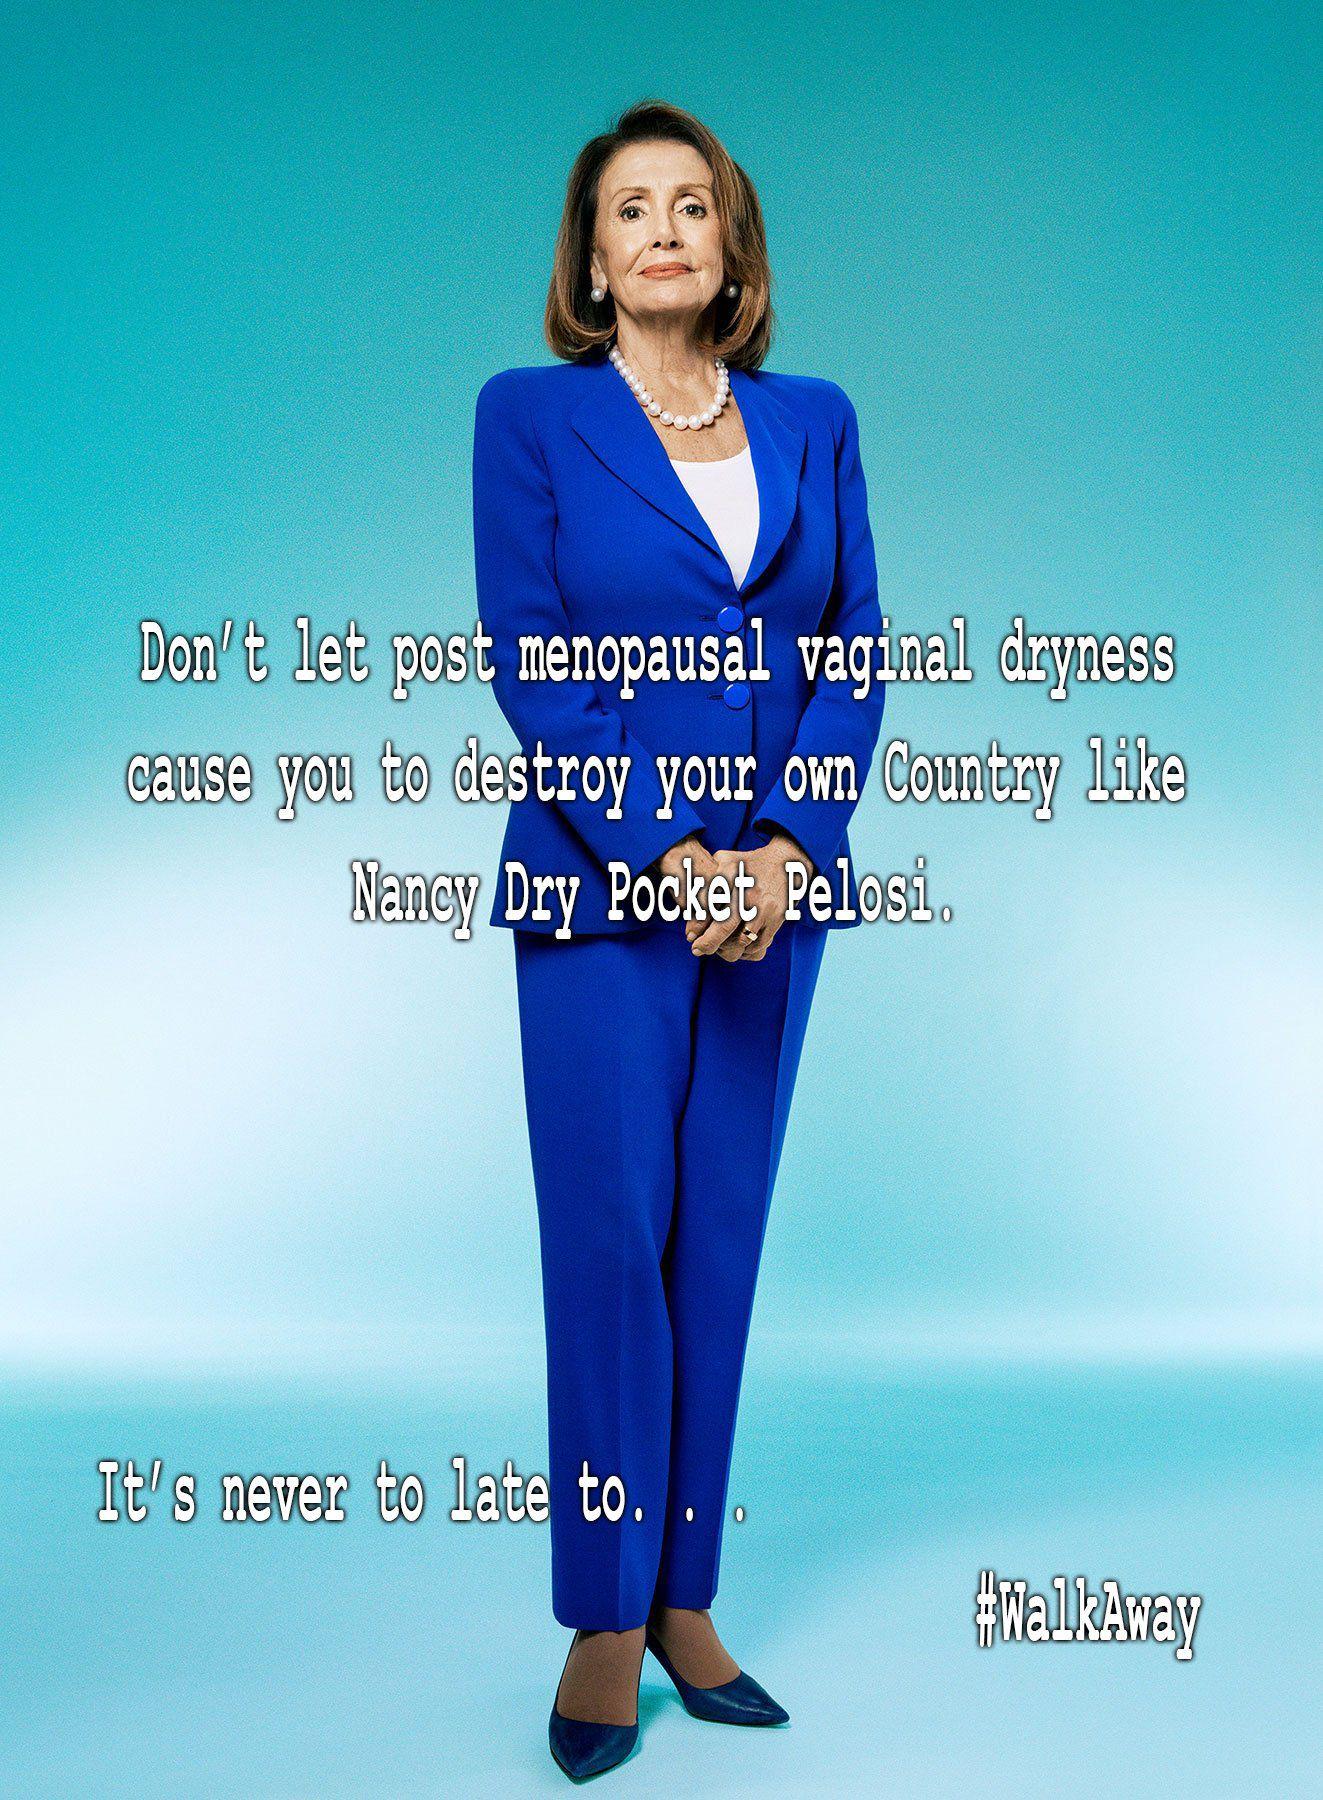 Nancy Dry Pocket Pelosi